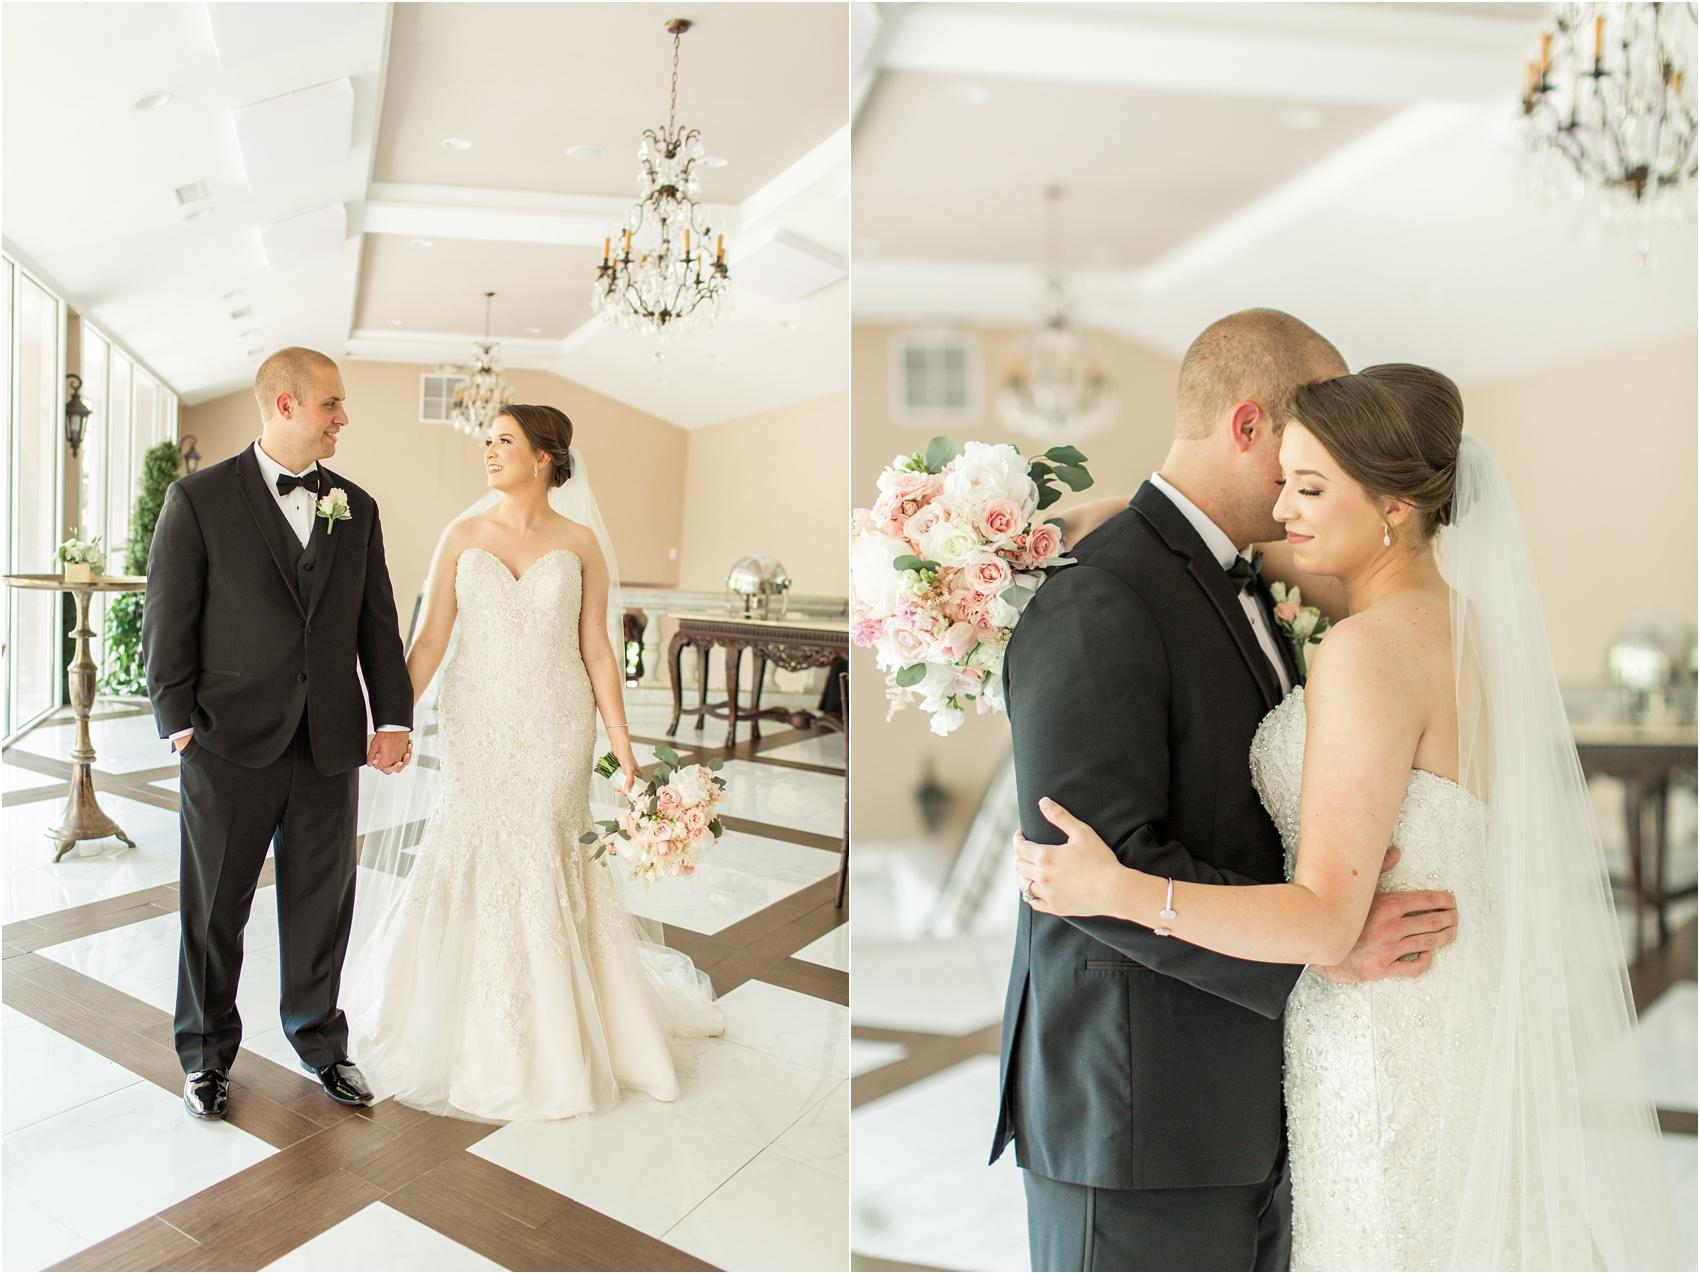 Savannah Eve Photography- Nutt Wedding- Blog-35.jpg